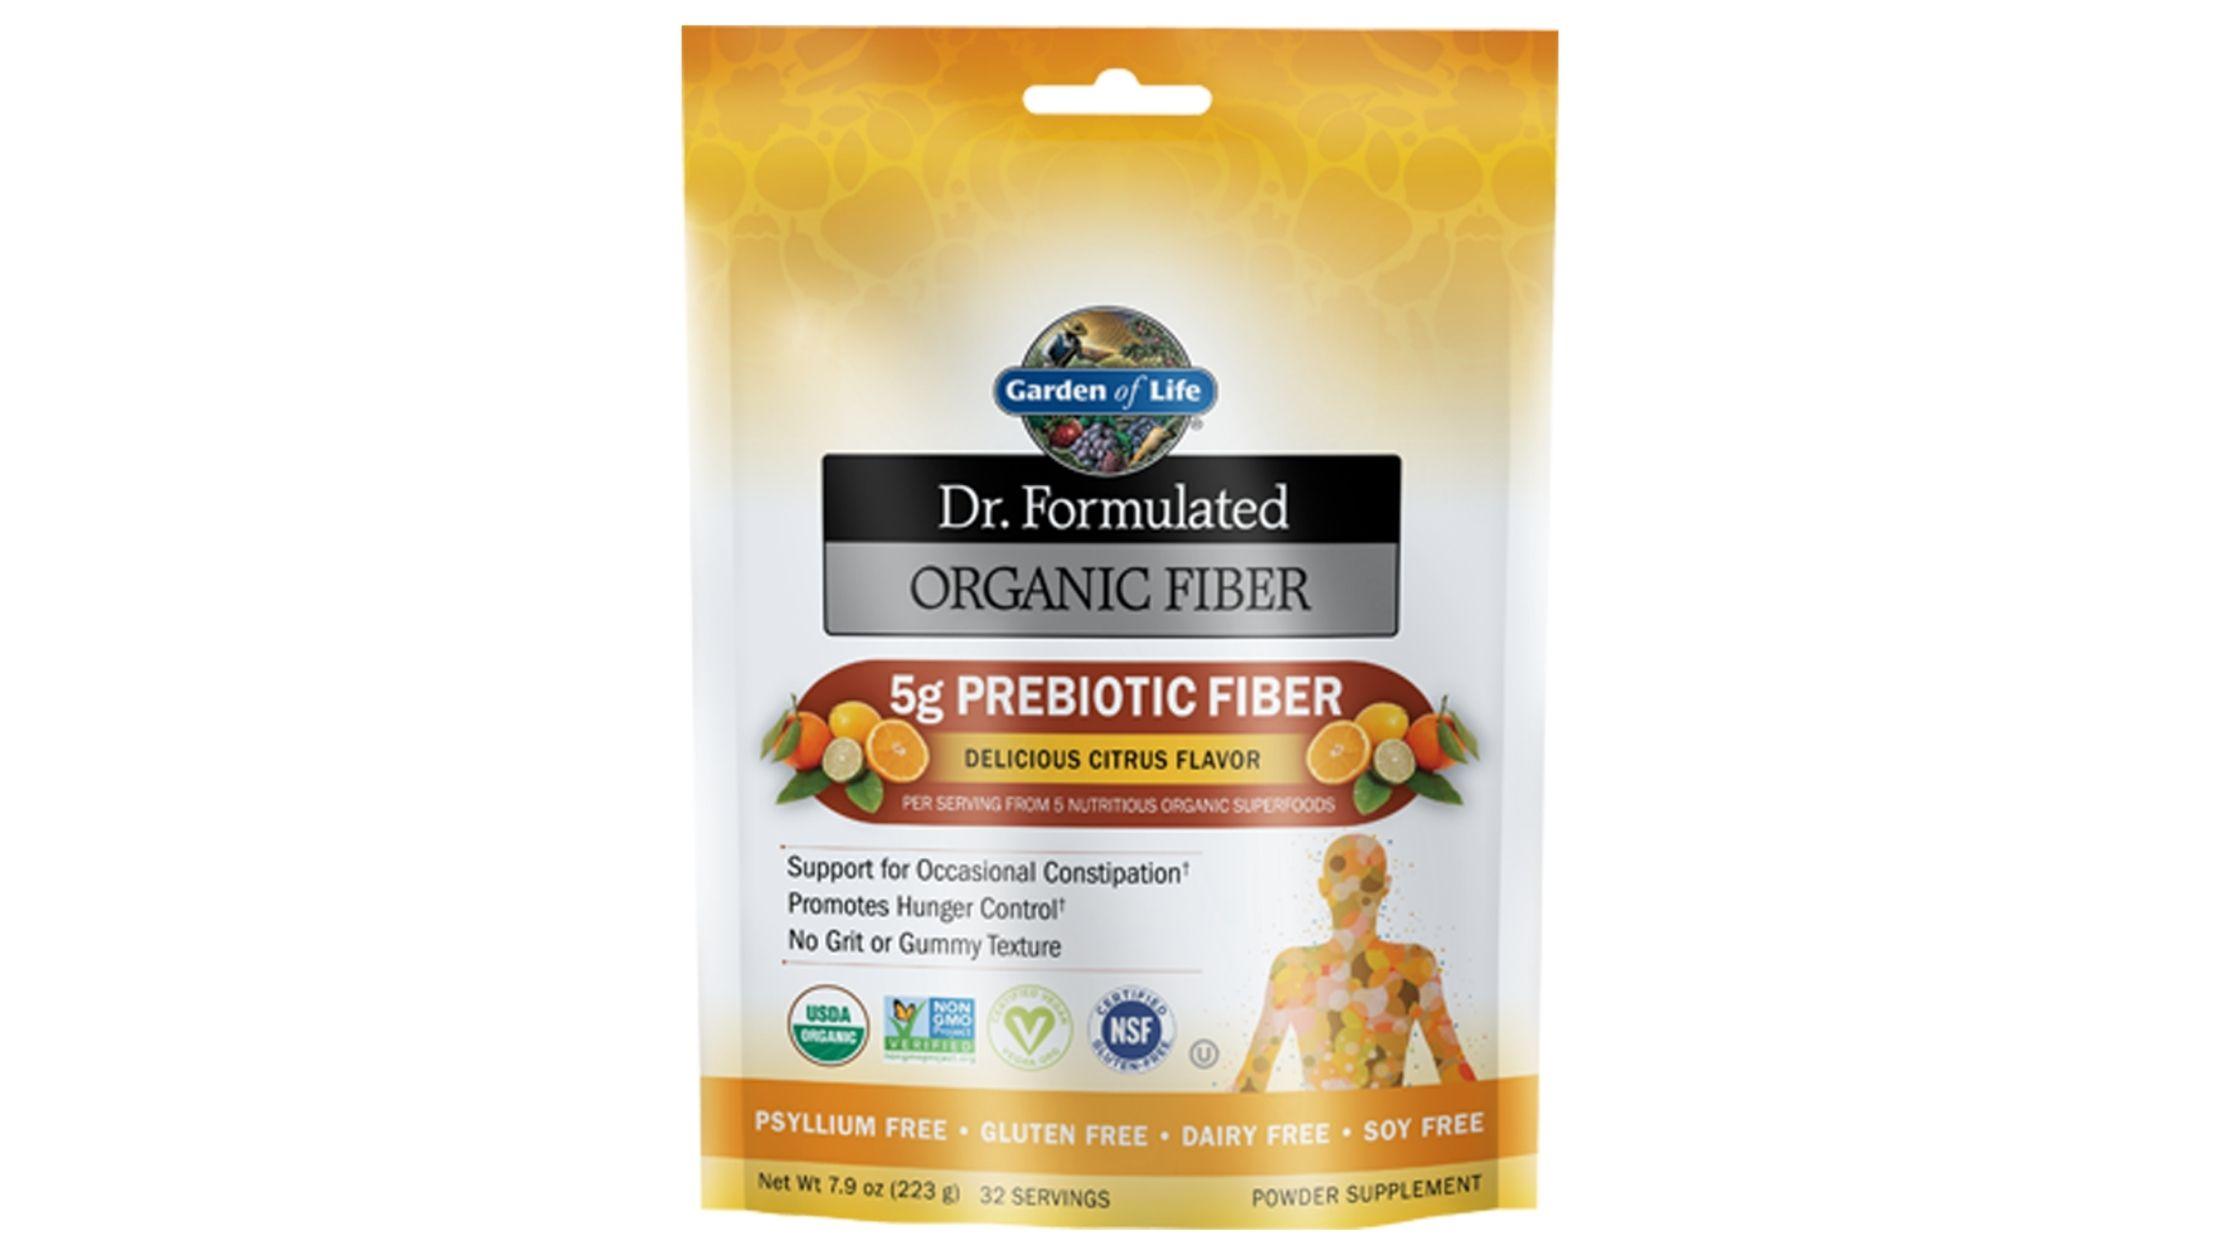 Garden of Life Dr. Formulated Organic Fiber